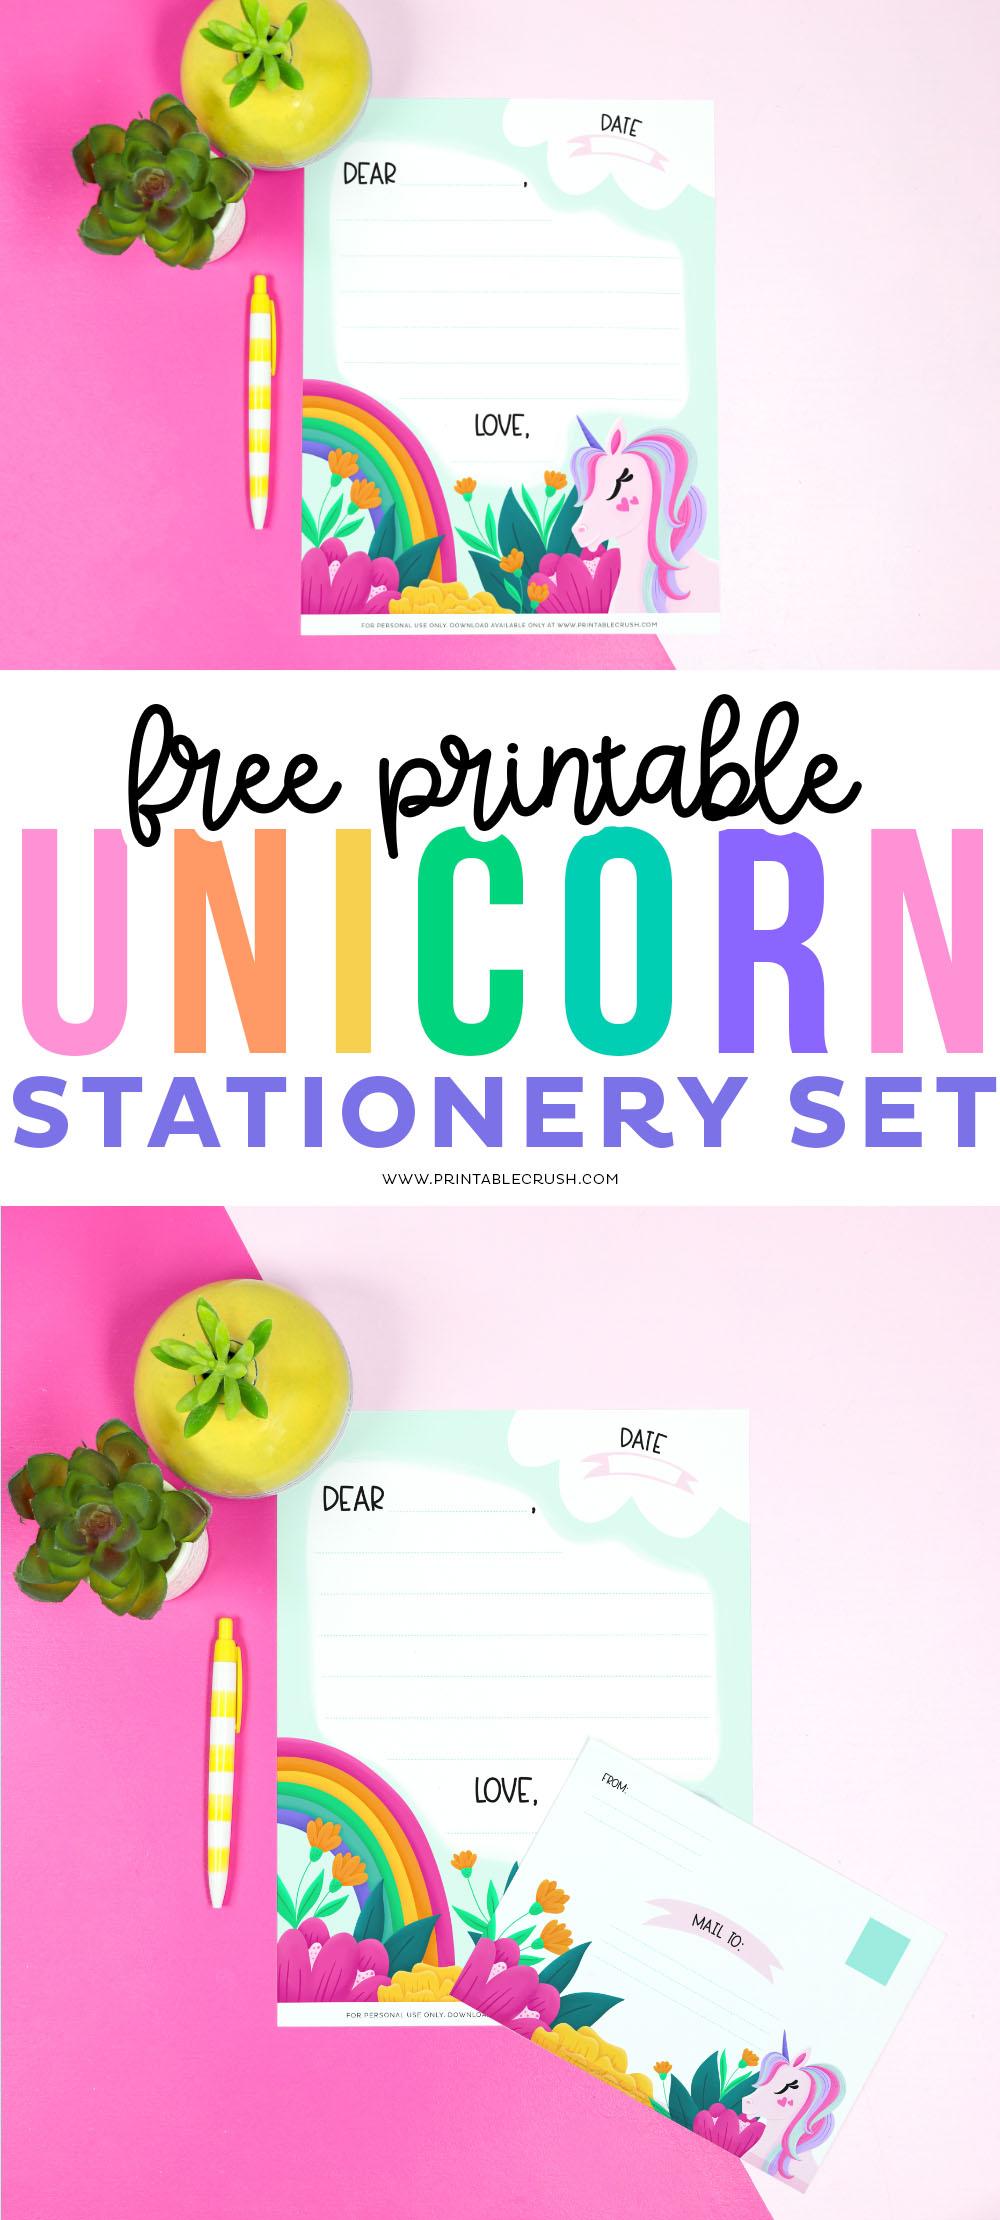 Free Printable Unicorn Stationery Set - Printable Crush